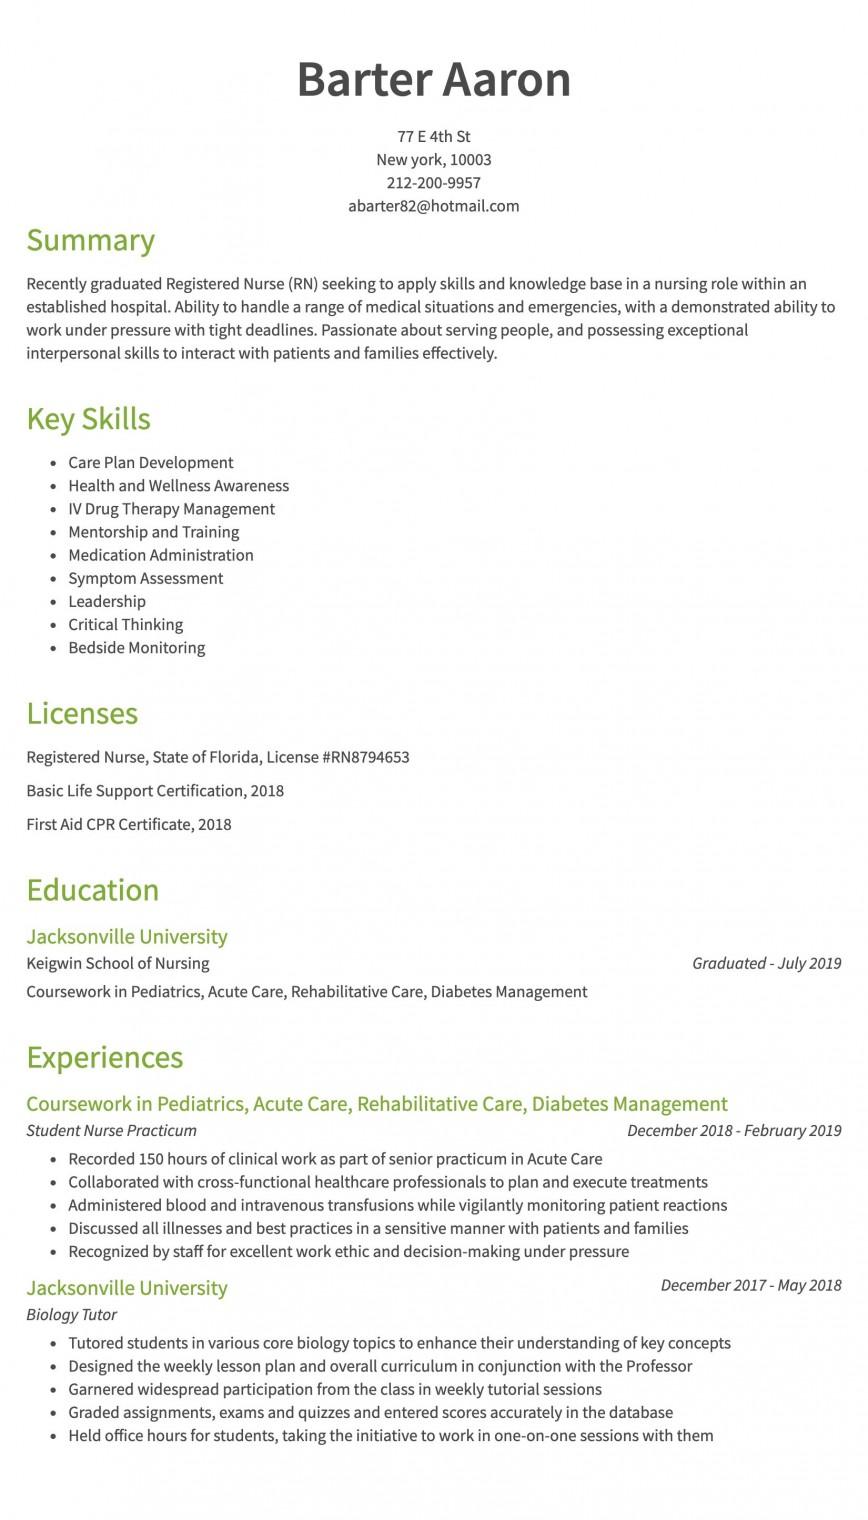 007 Striking Rn Graduate Resume Template High Resolution  New Grad Nurse868